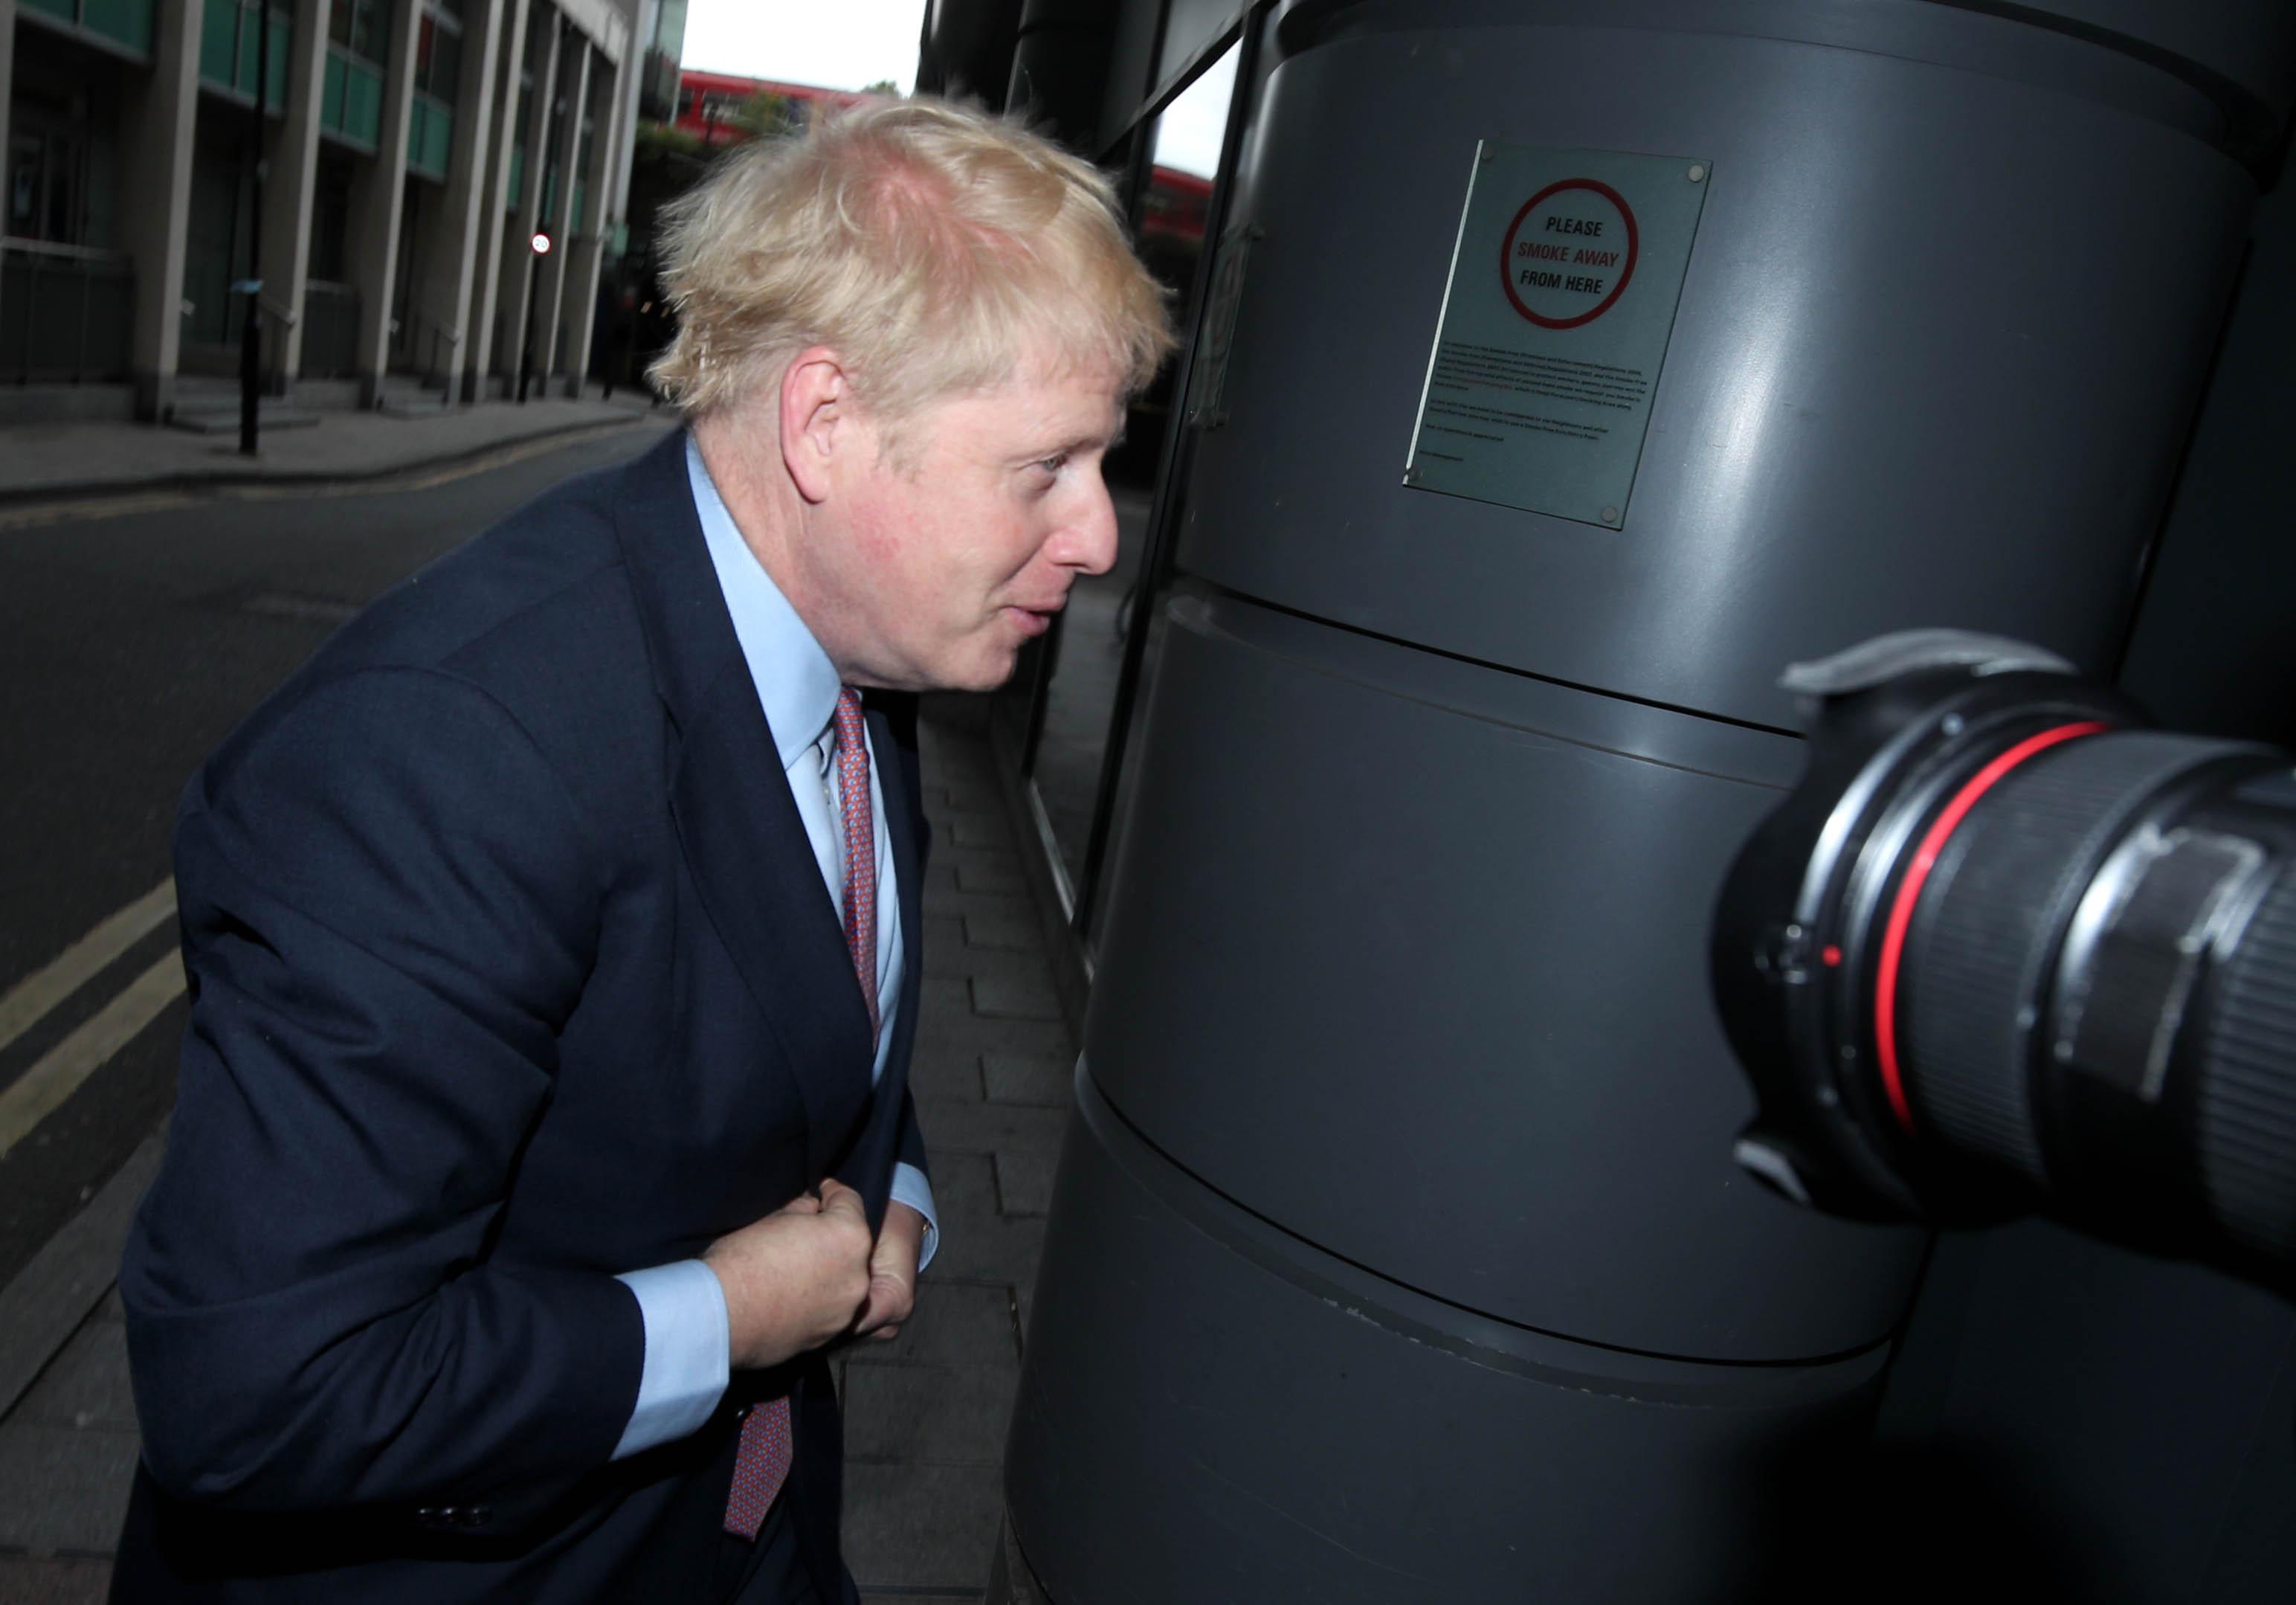 Conservative party leadership contender Boris Johnson